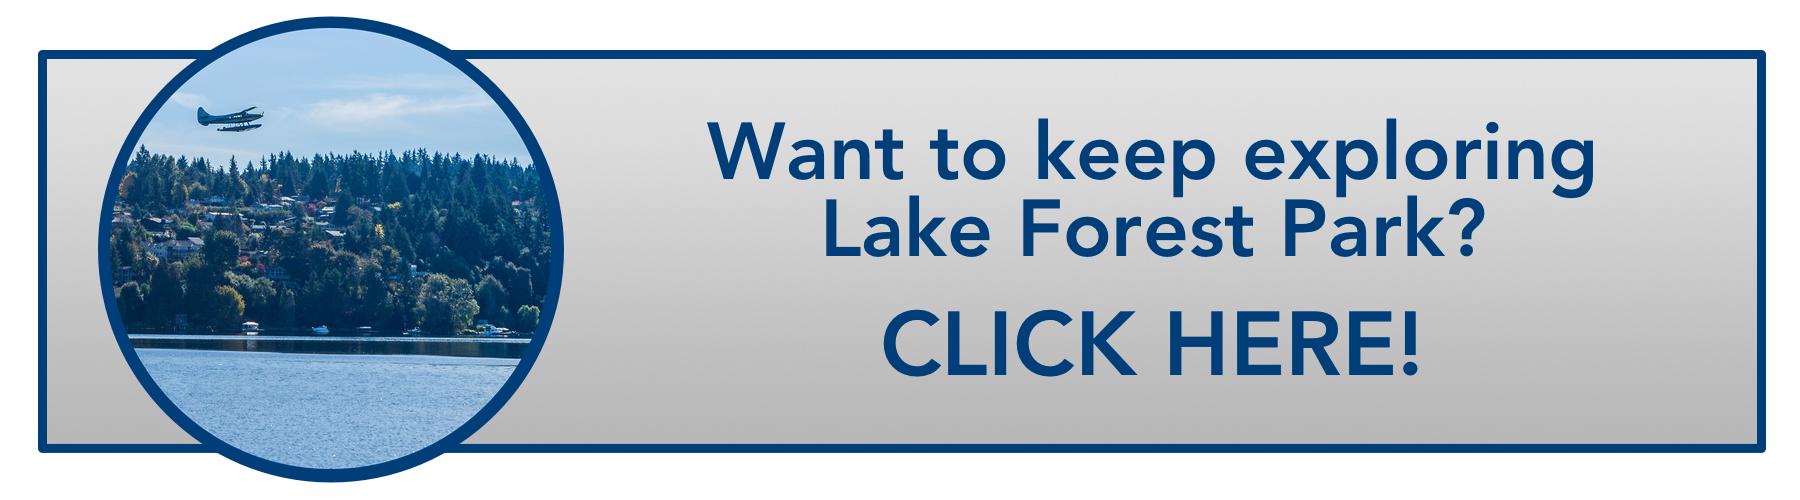 WindermereNorth_LakeForestPark_WanttokeepexploringClickhere.jpg